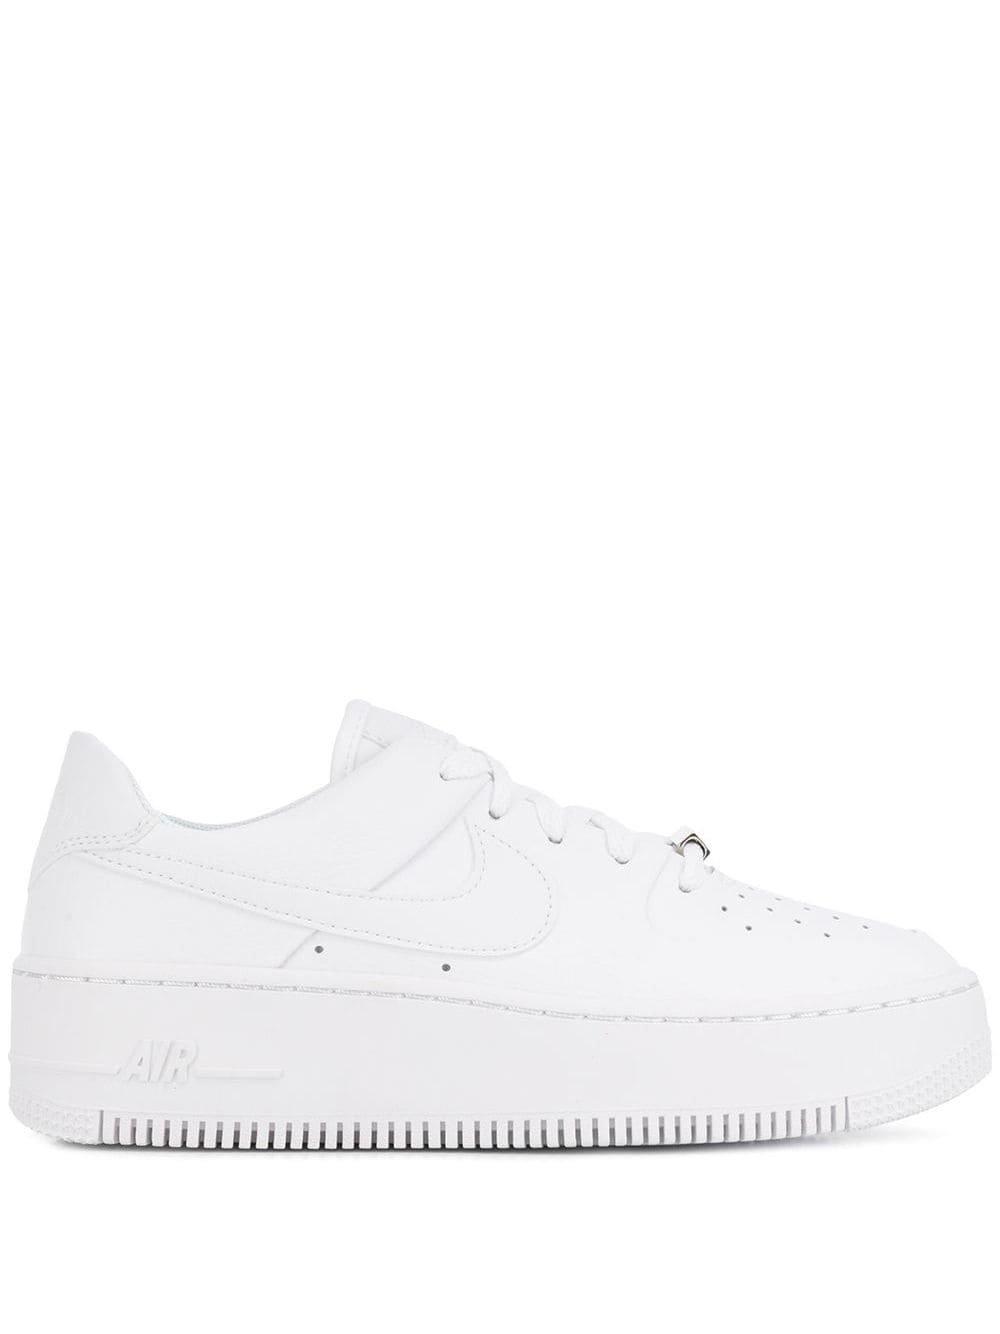 White Nike Air Force 1 Sneakers   Farfetch.com